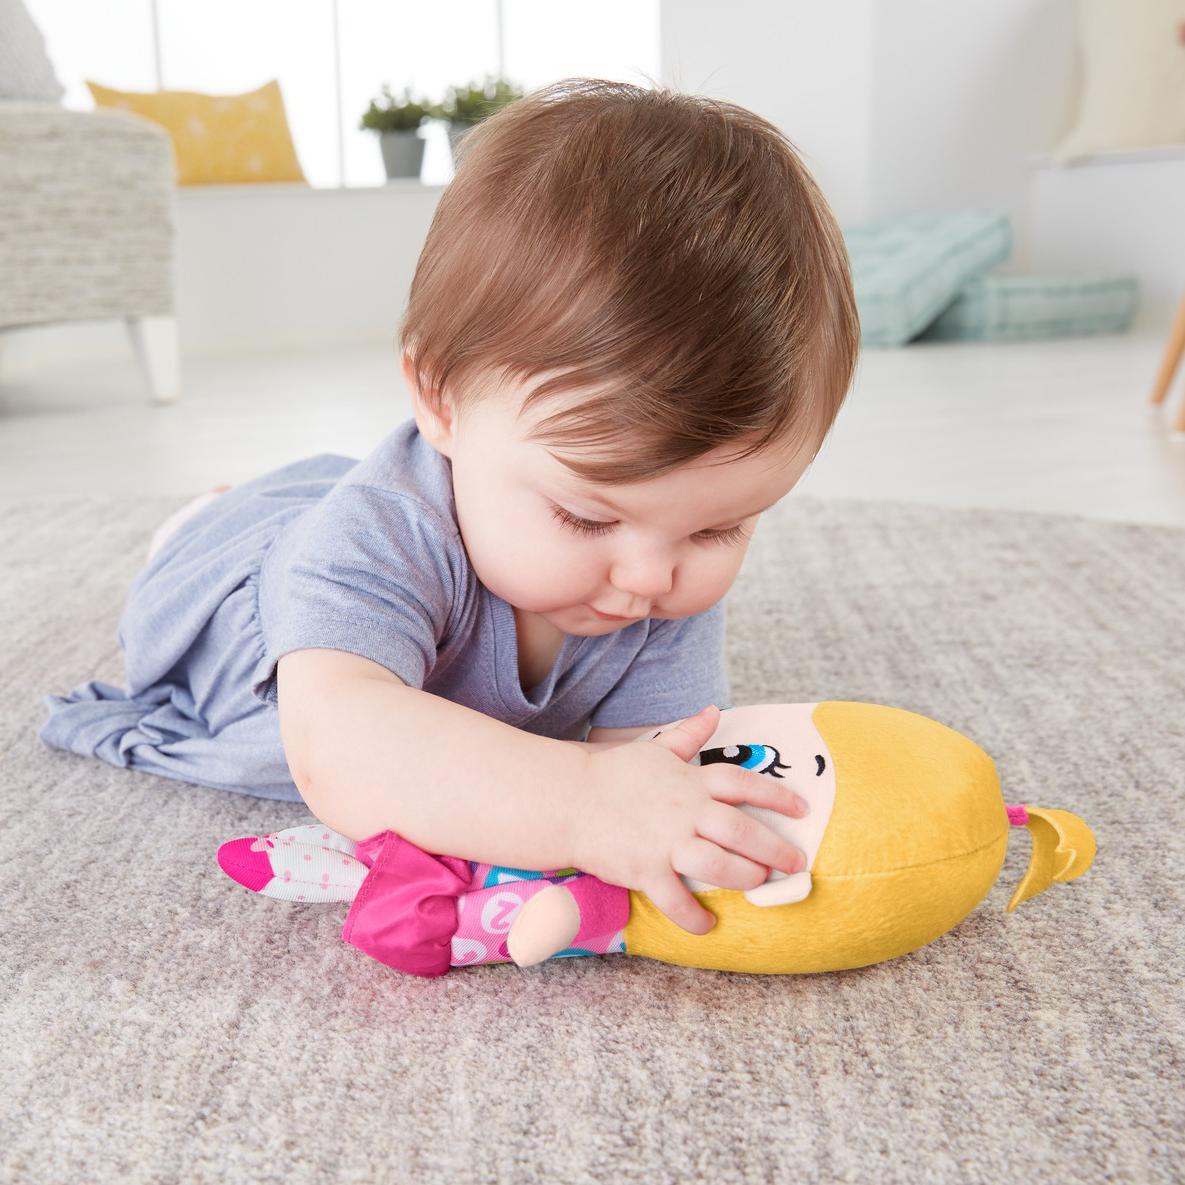 Amazon.com: Fisher-Price Laugh & Learn My aprendizaje muñeca ...